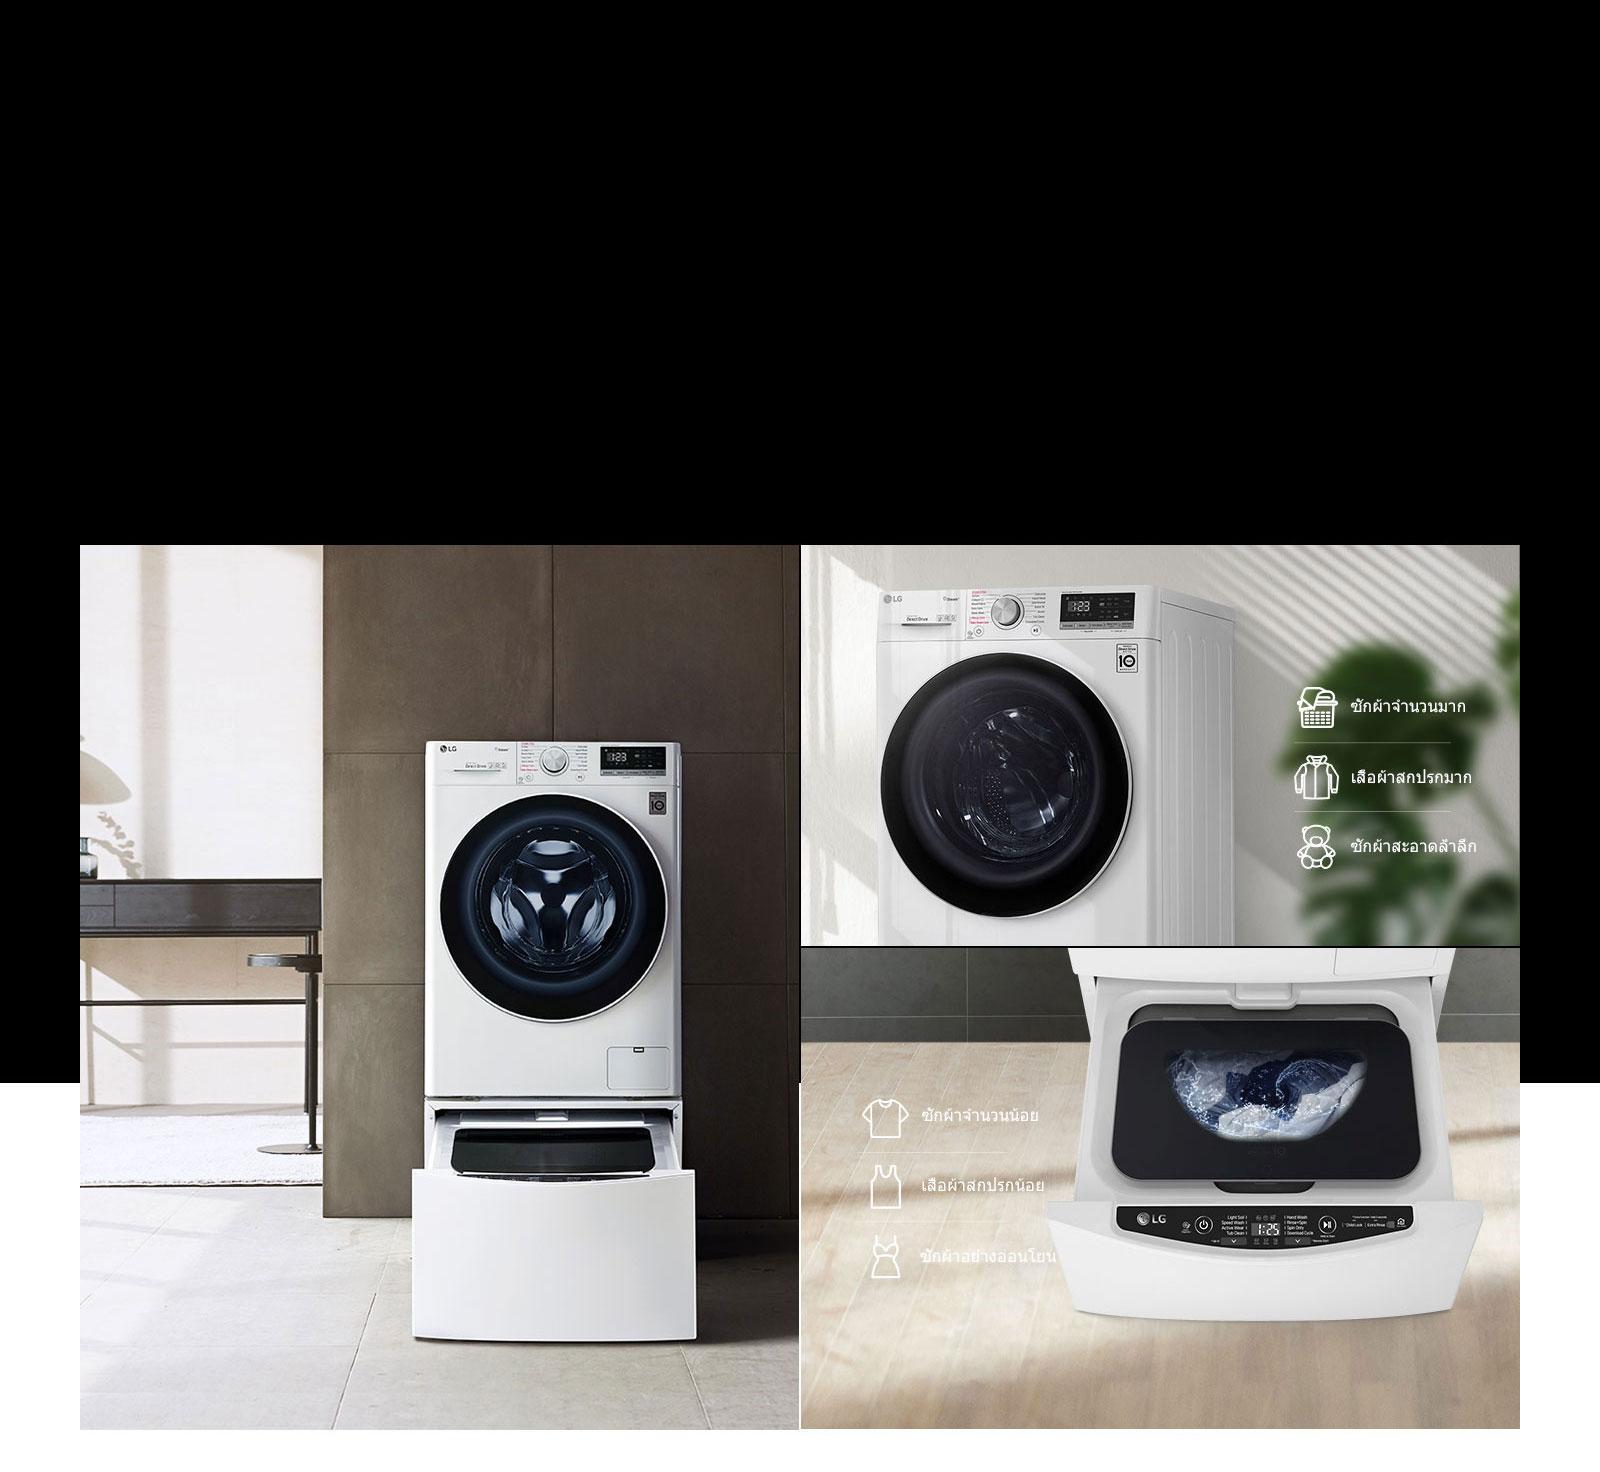 WM-Vivace-V500-VC4-White-08-1-Compatibility-24092019-D